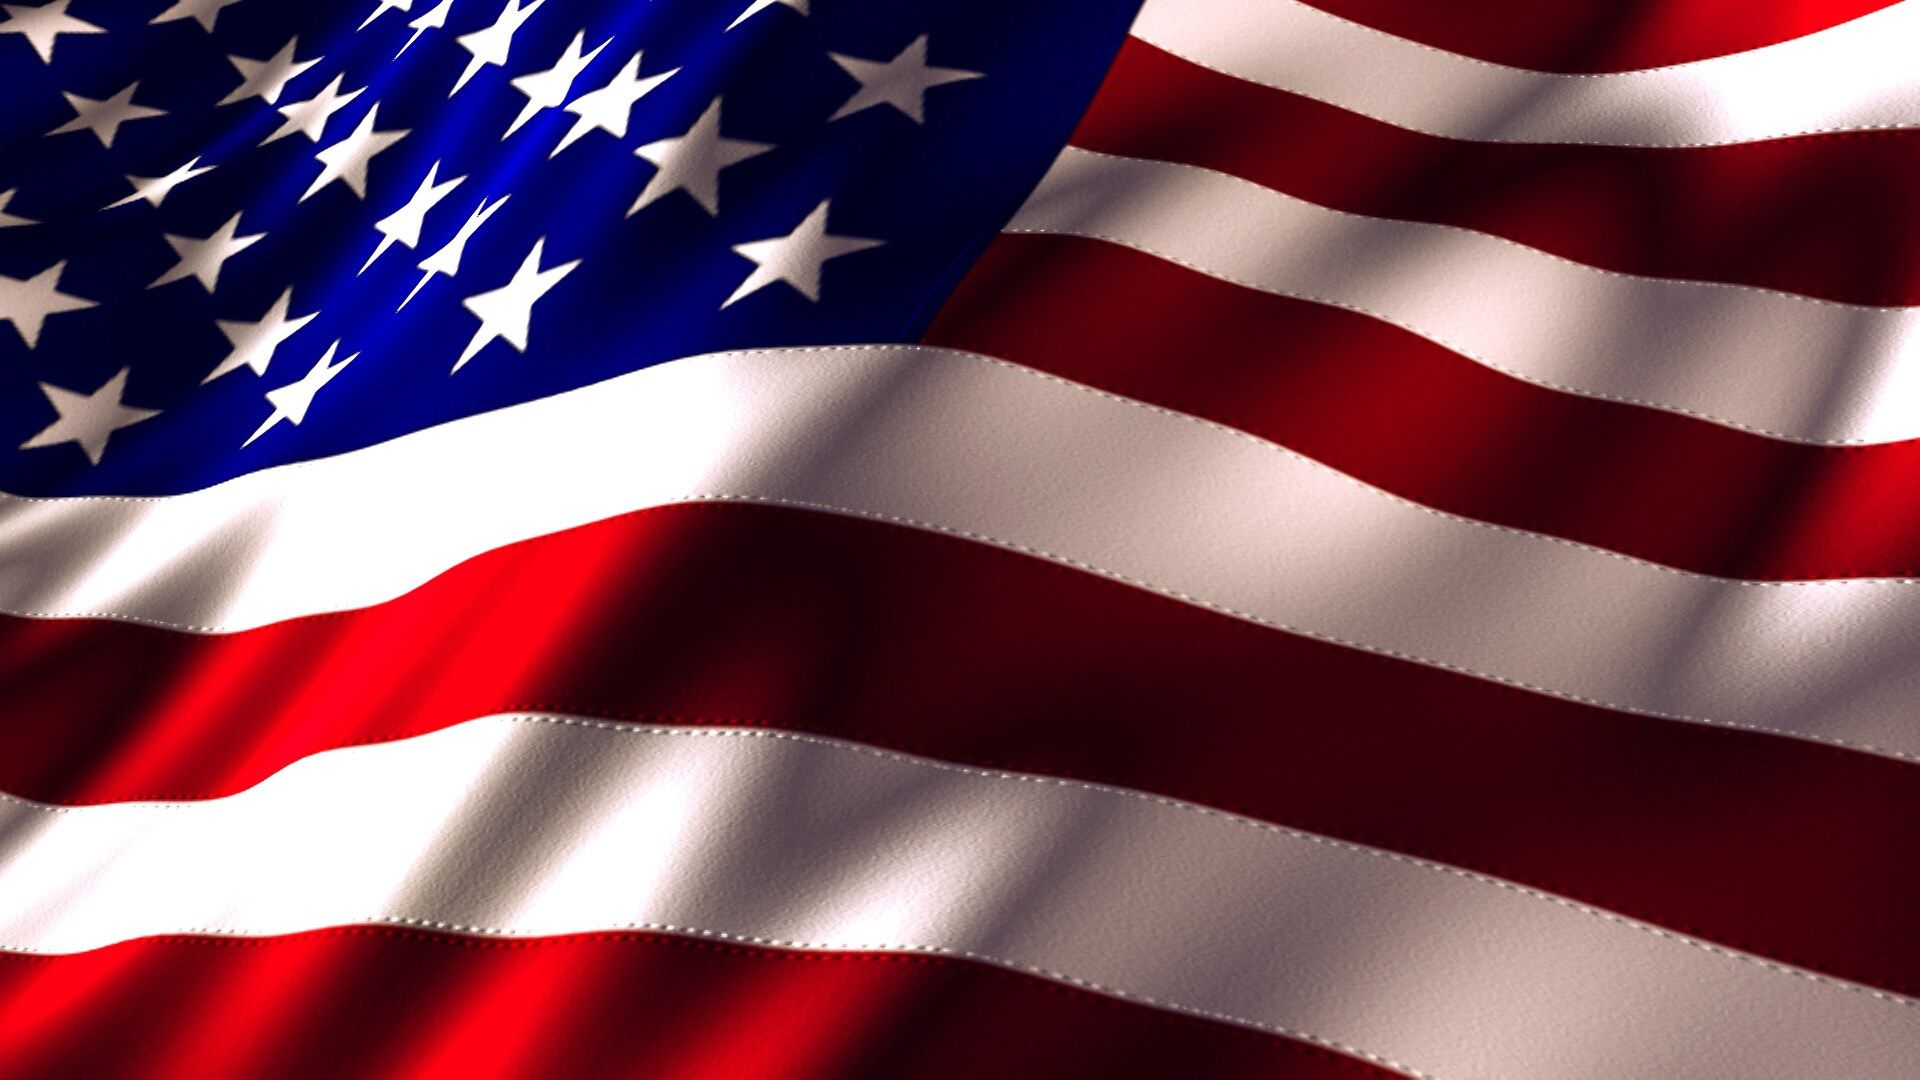 American Flag Wallpaper Hd Pack American Flag Wallpaper American Flag Flag